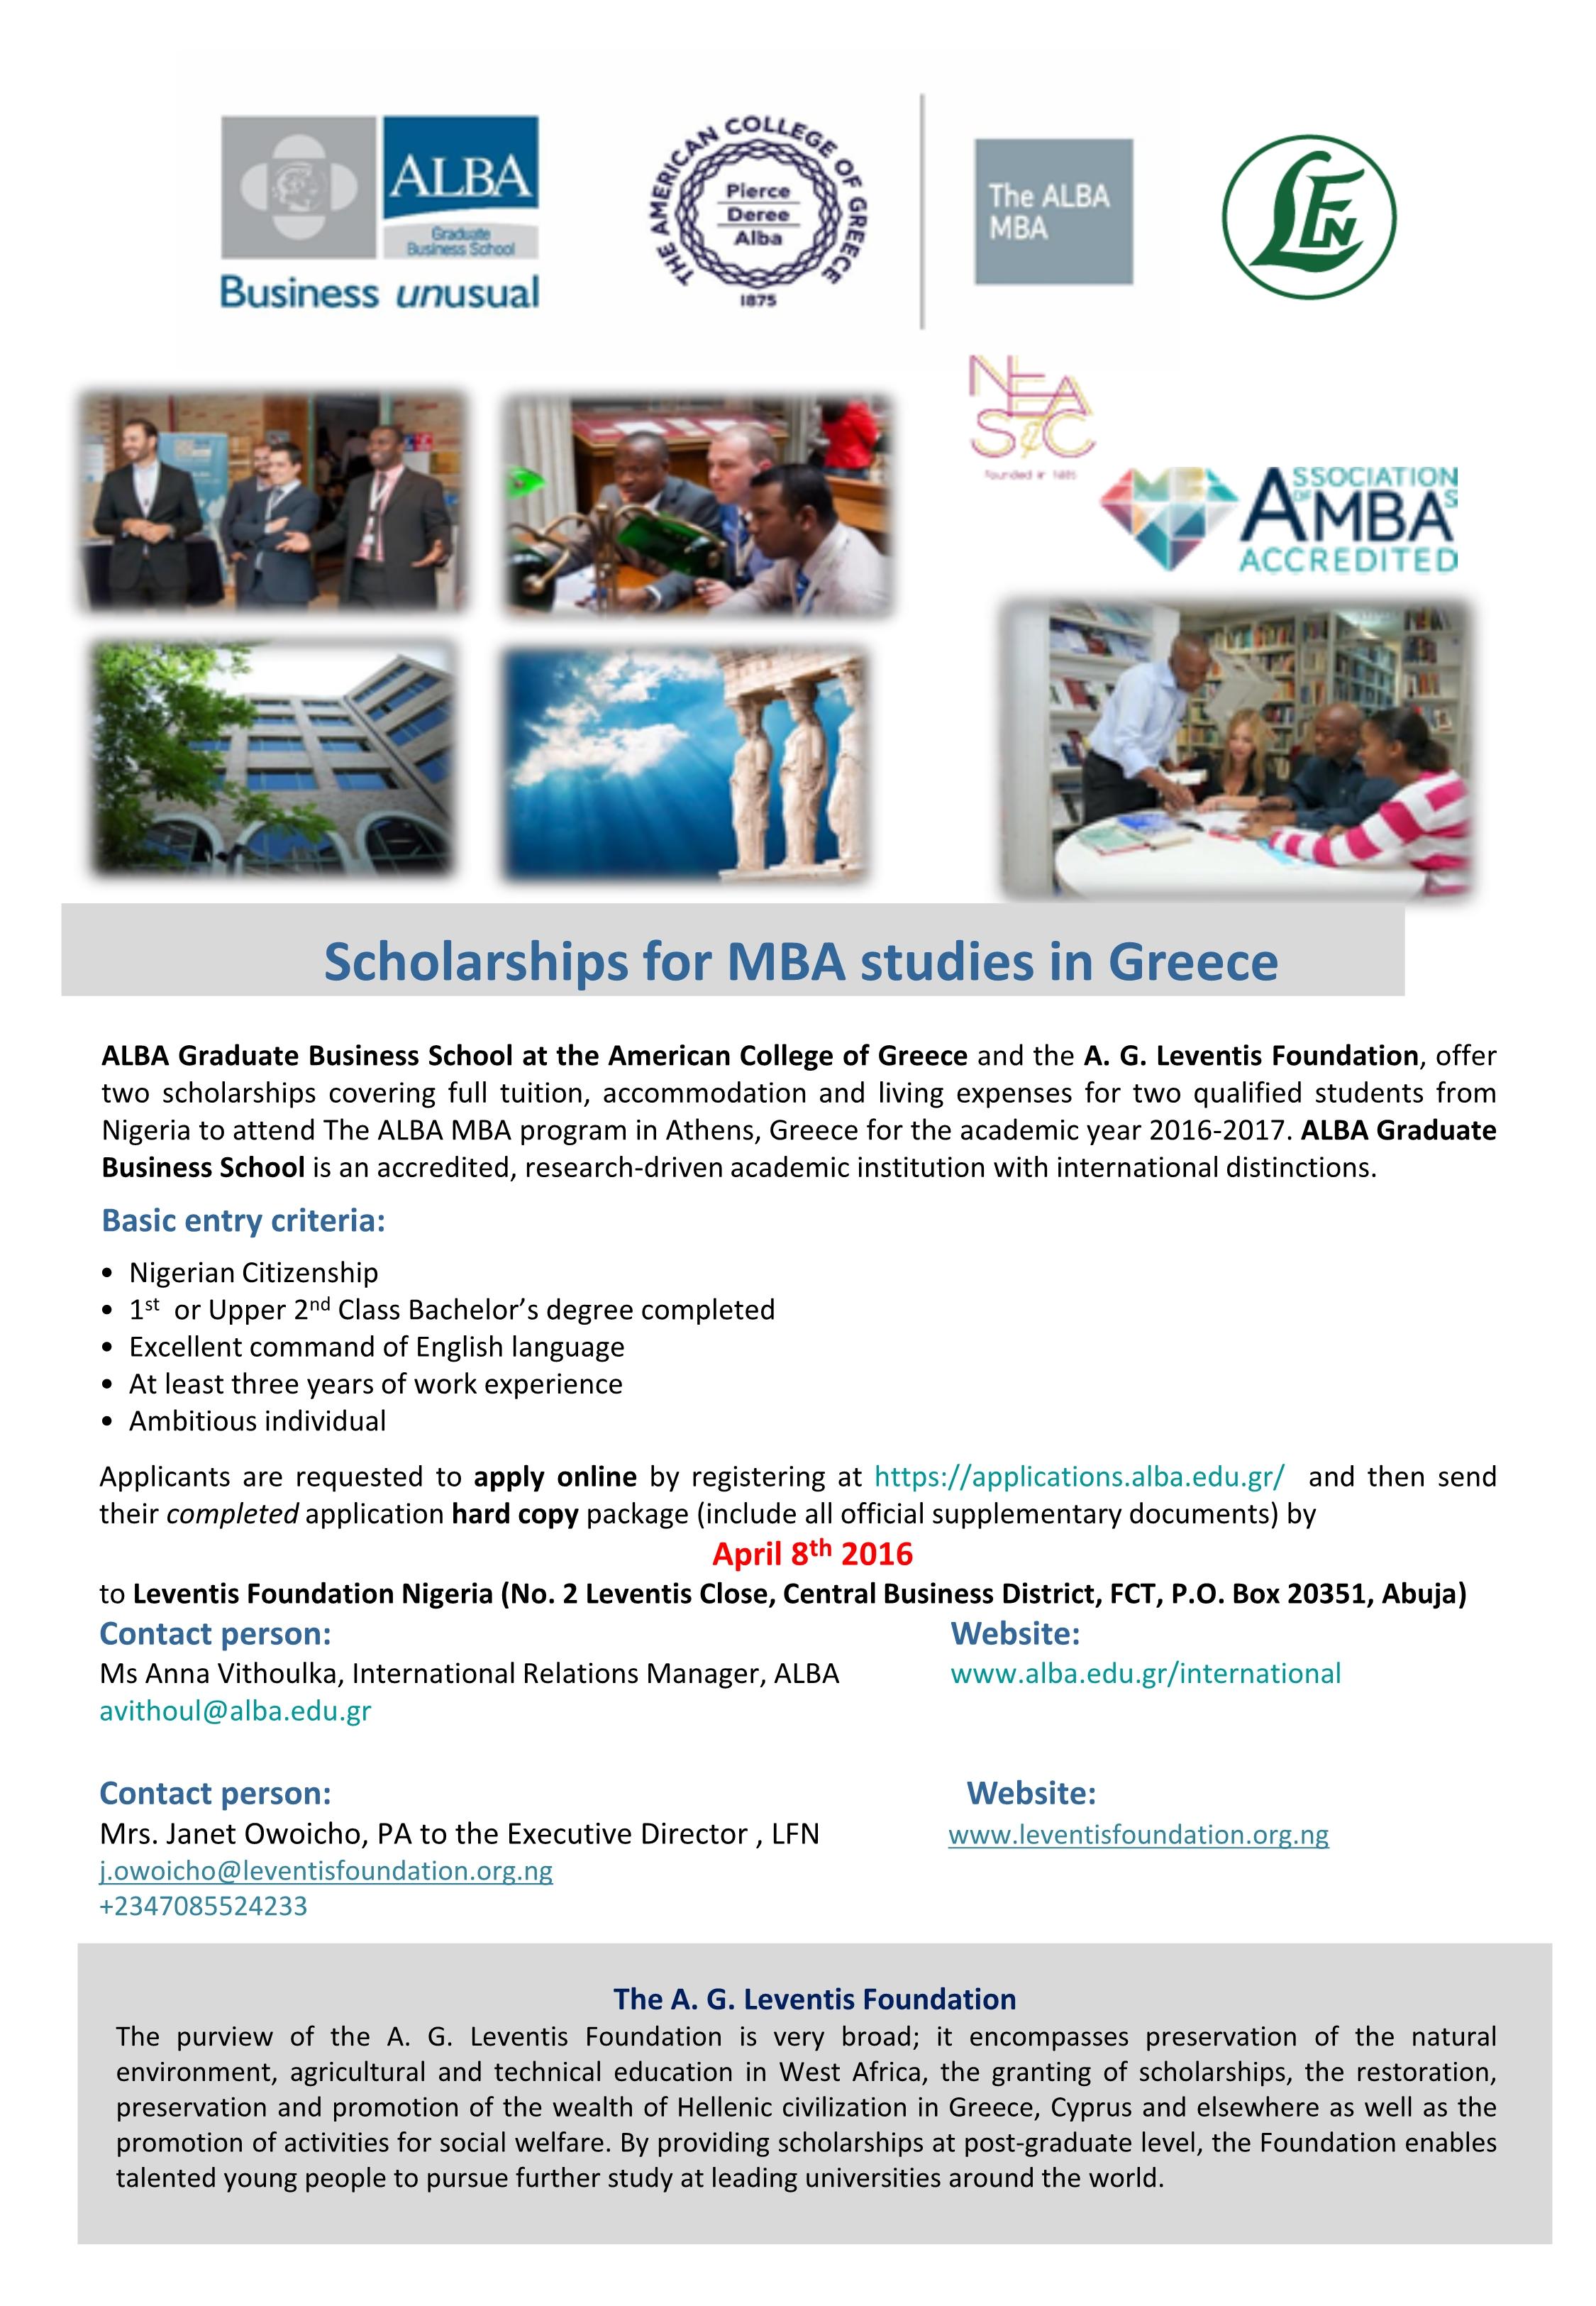 Leventis Foundation 2016 Scholarship for ALBA Graduate School, Greece.